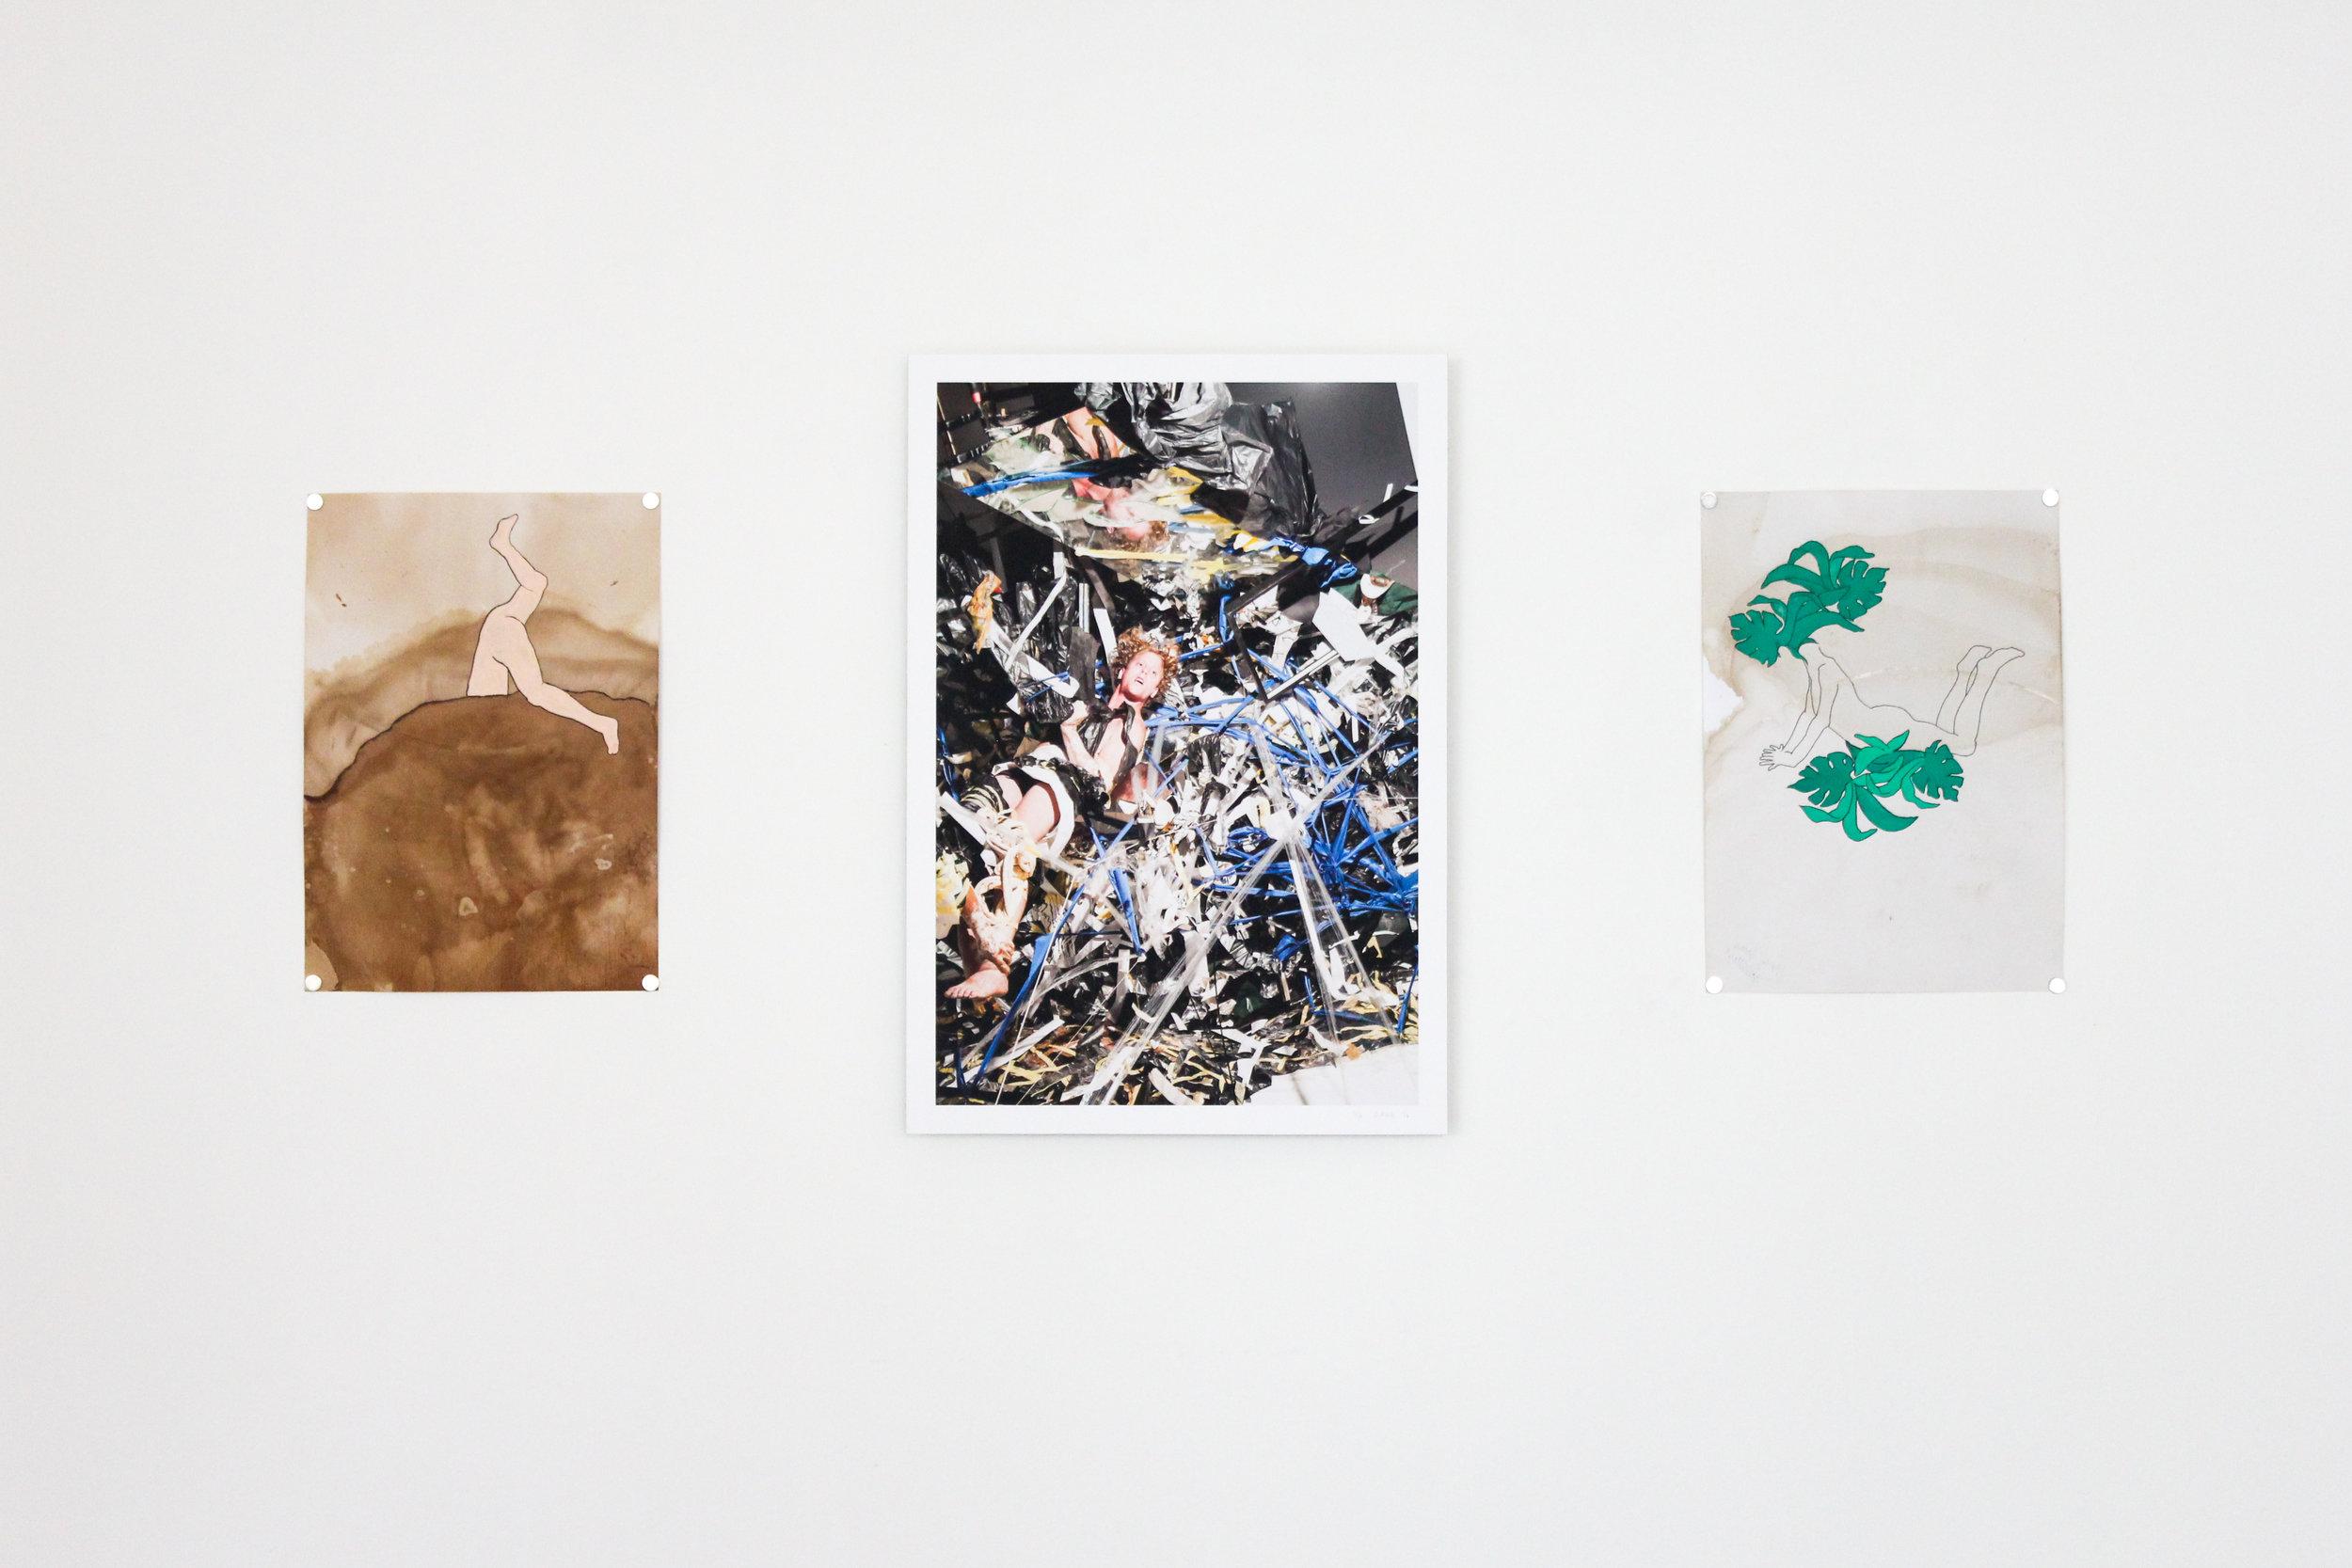 Triptych-6988.jpg